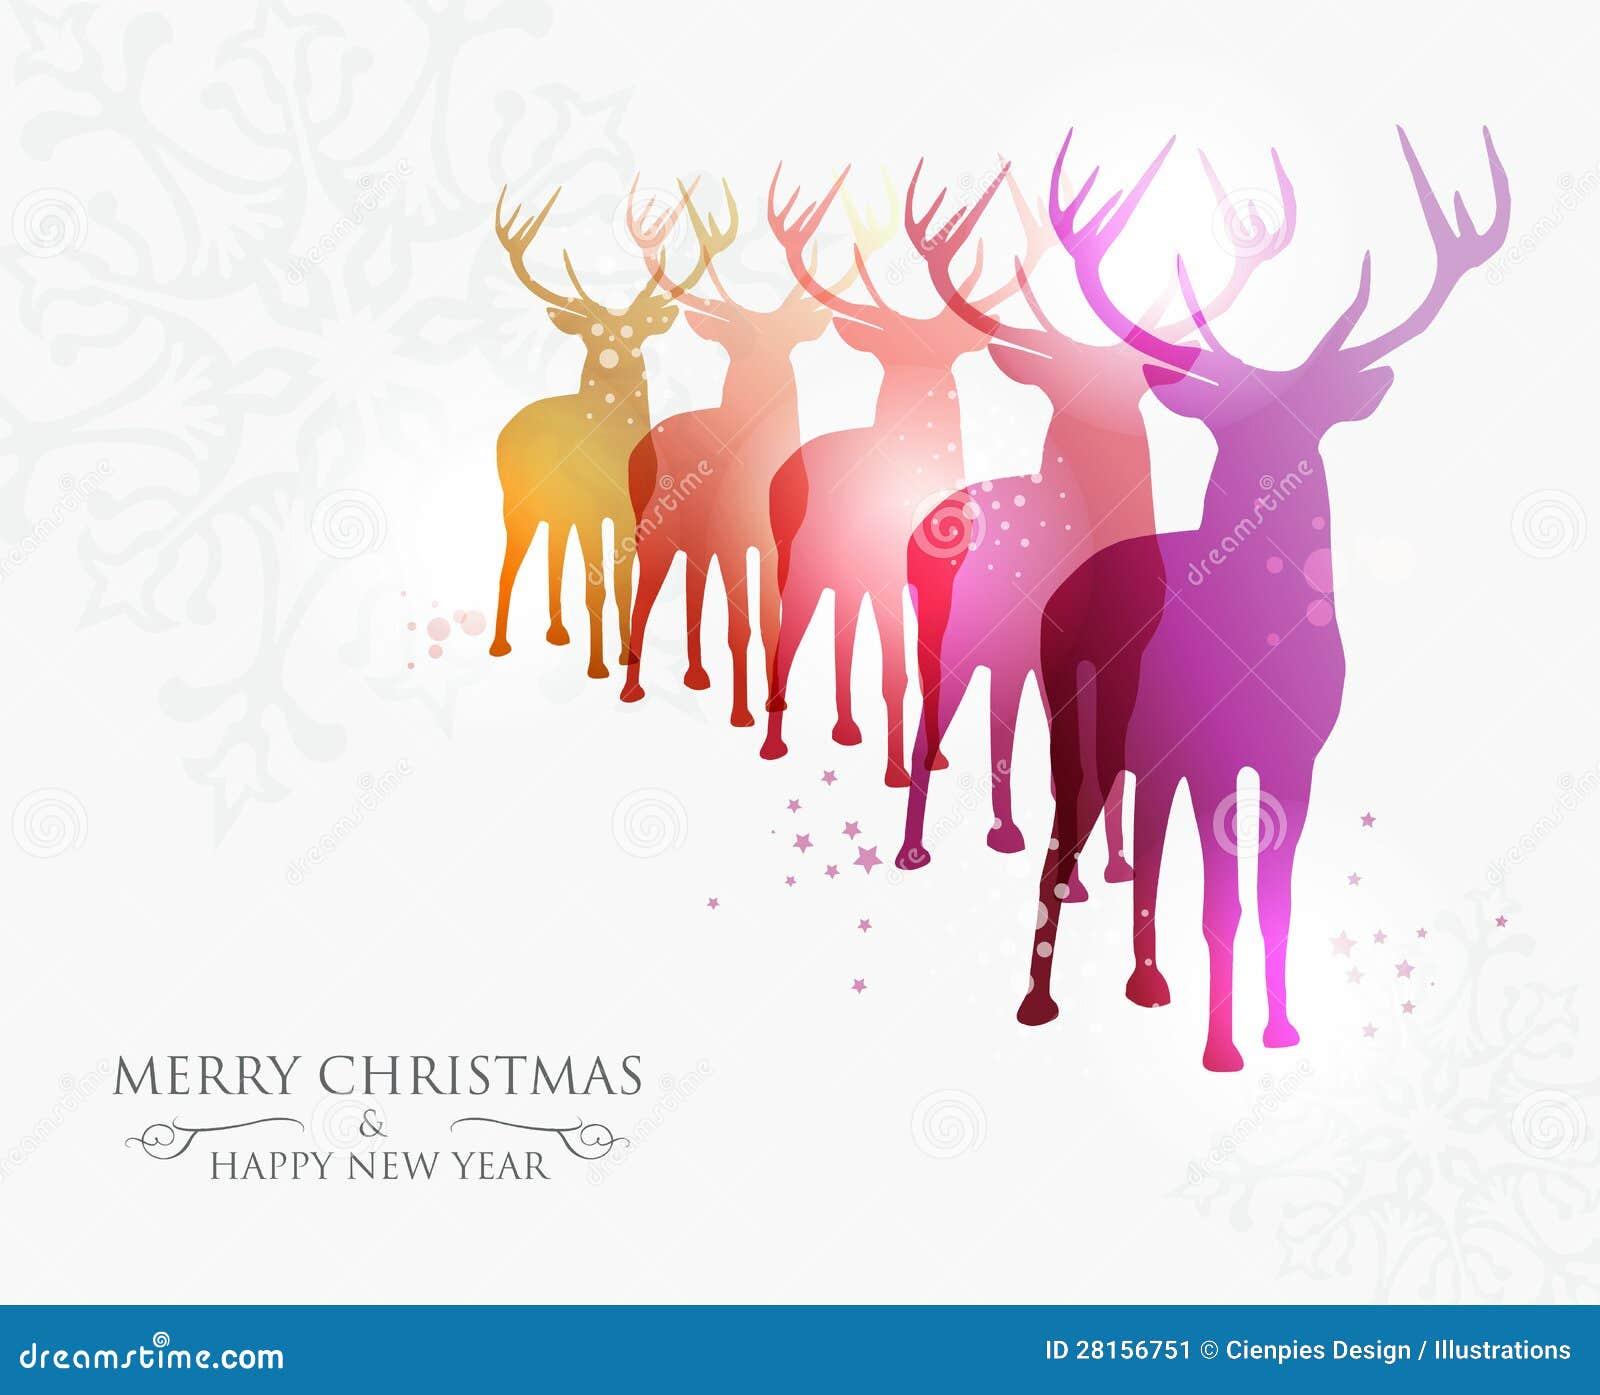 Merry Christmas Contemporary Ideas Stock Image